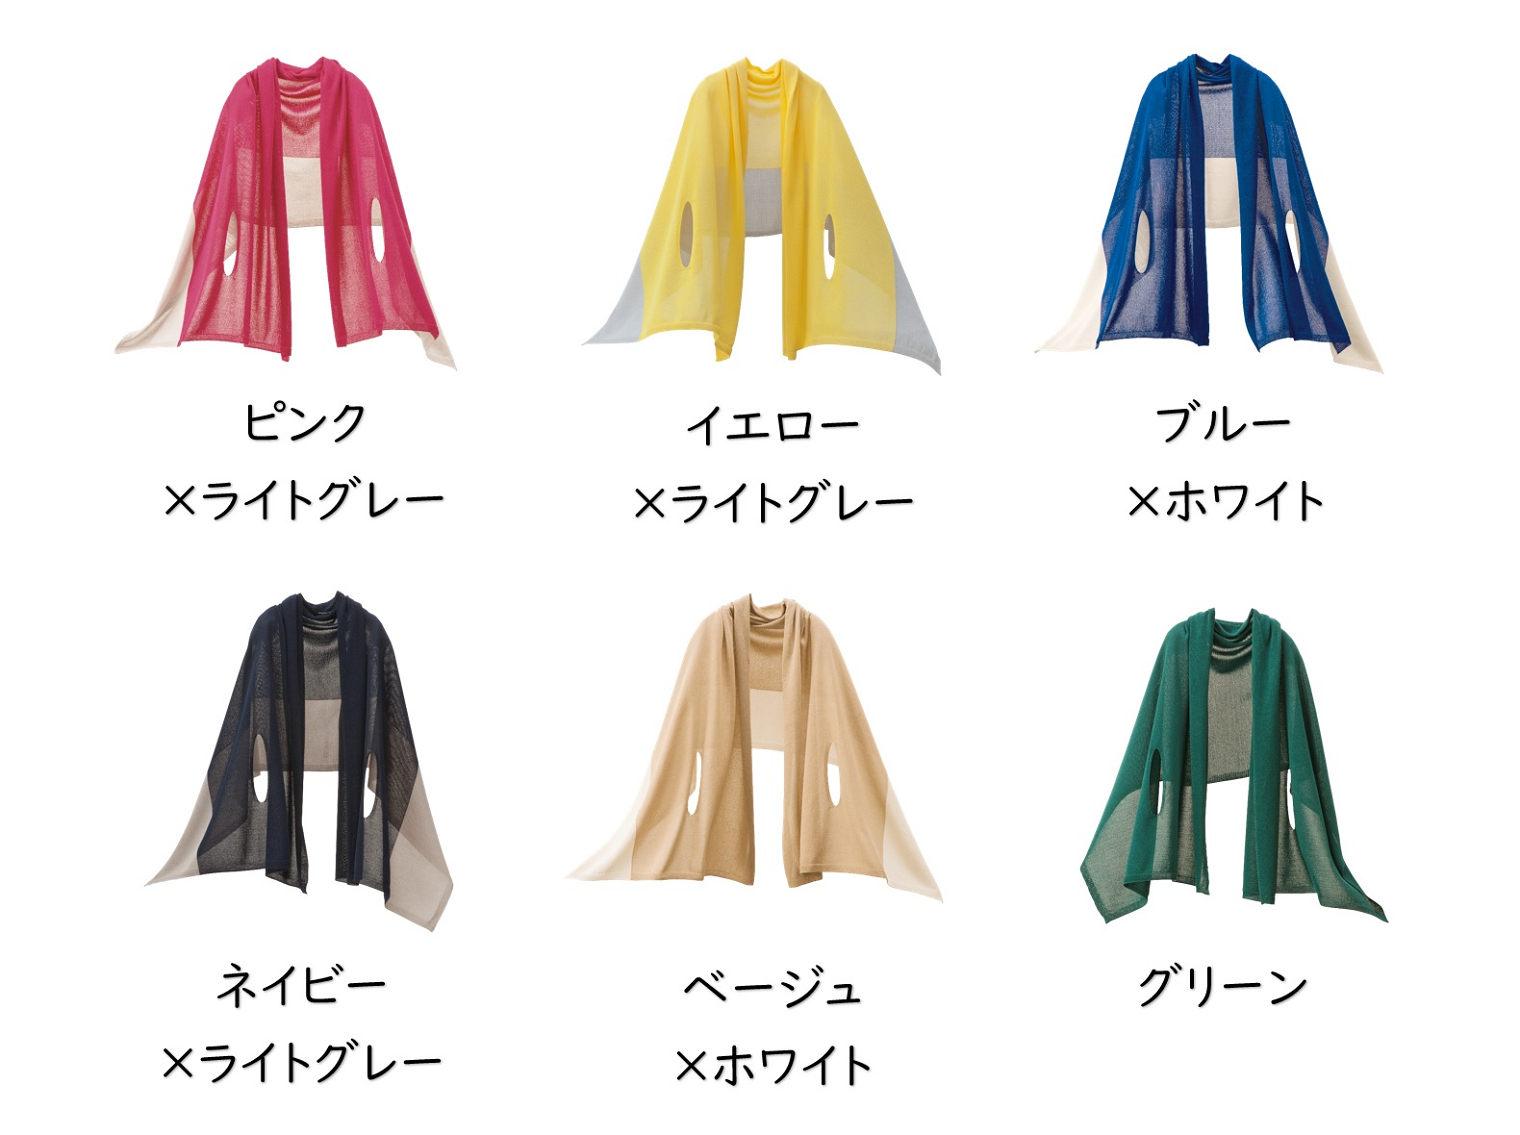 nico ストールポンチョ 洗えるmino 和紙 カラー比較